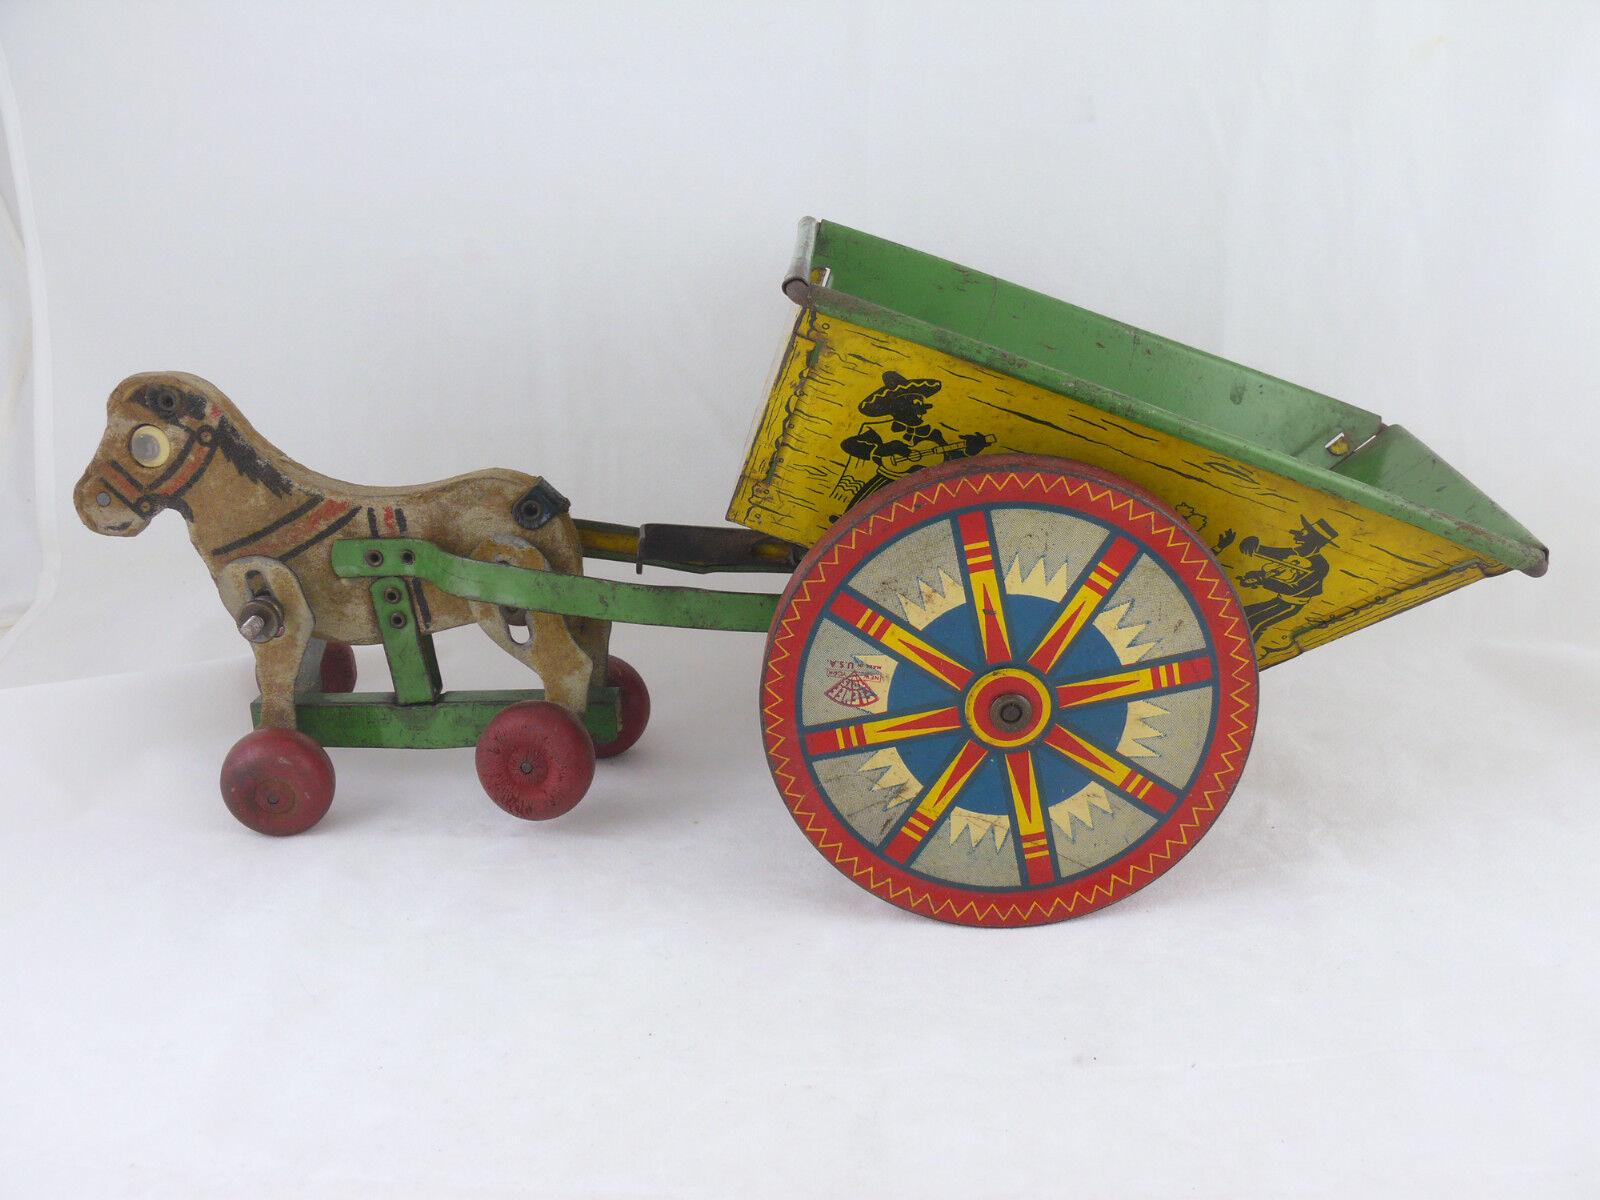 1948-1955 Horsedrawn elenee carro de juguete de estaño 15.5 Pulgadas W mexicanos canto, baile